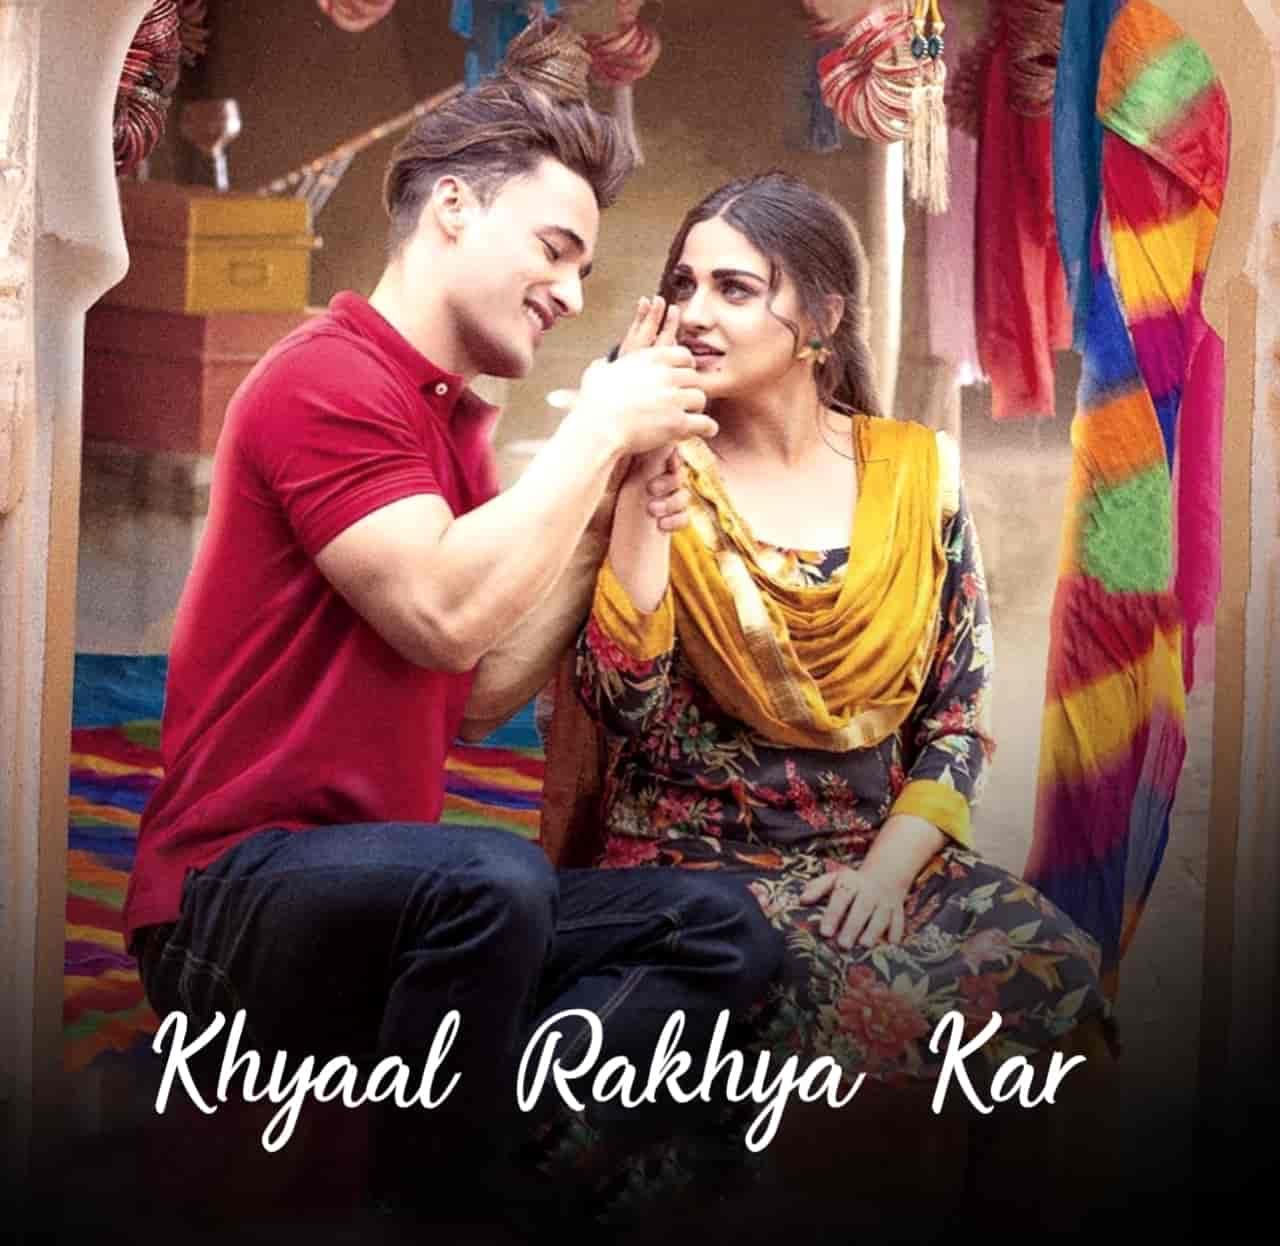 Khyaal Rakhya Kar Punjabi Song Image By Preetinder